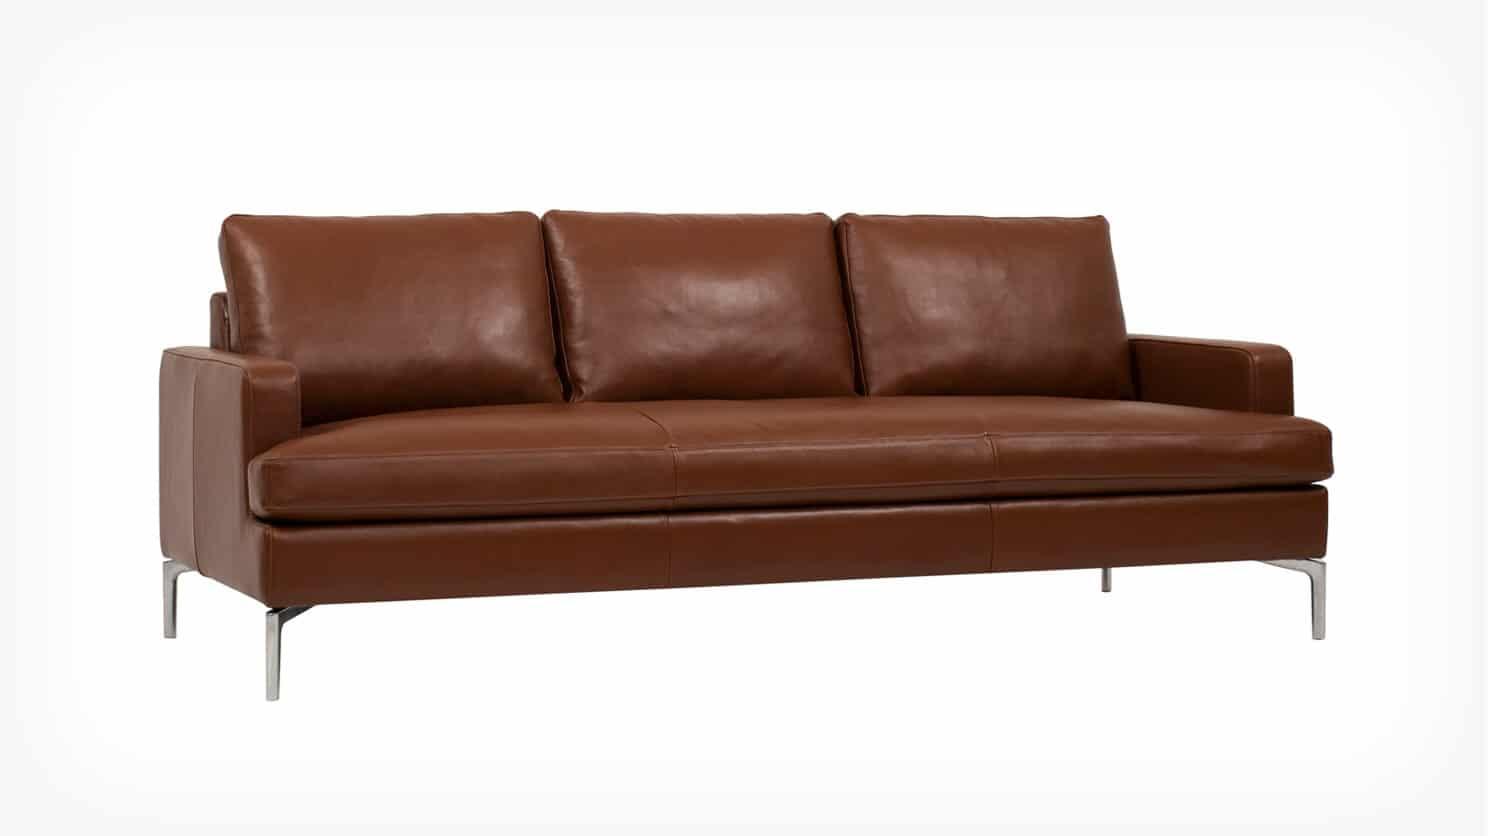 31127 01 02 sofa eve classic durango rio front angled view